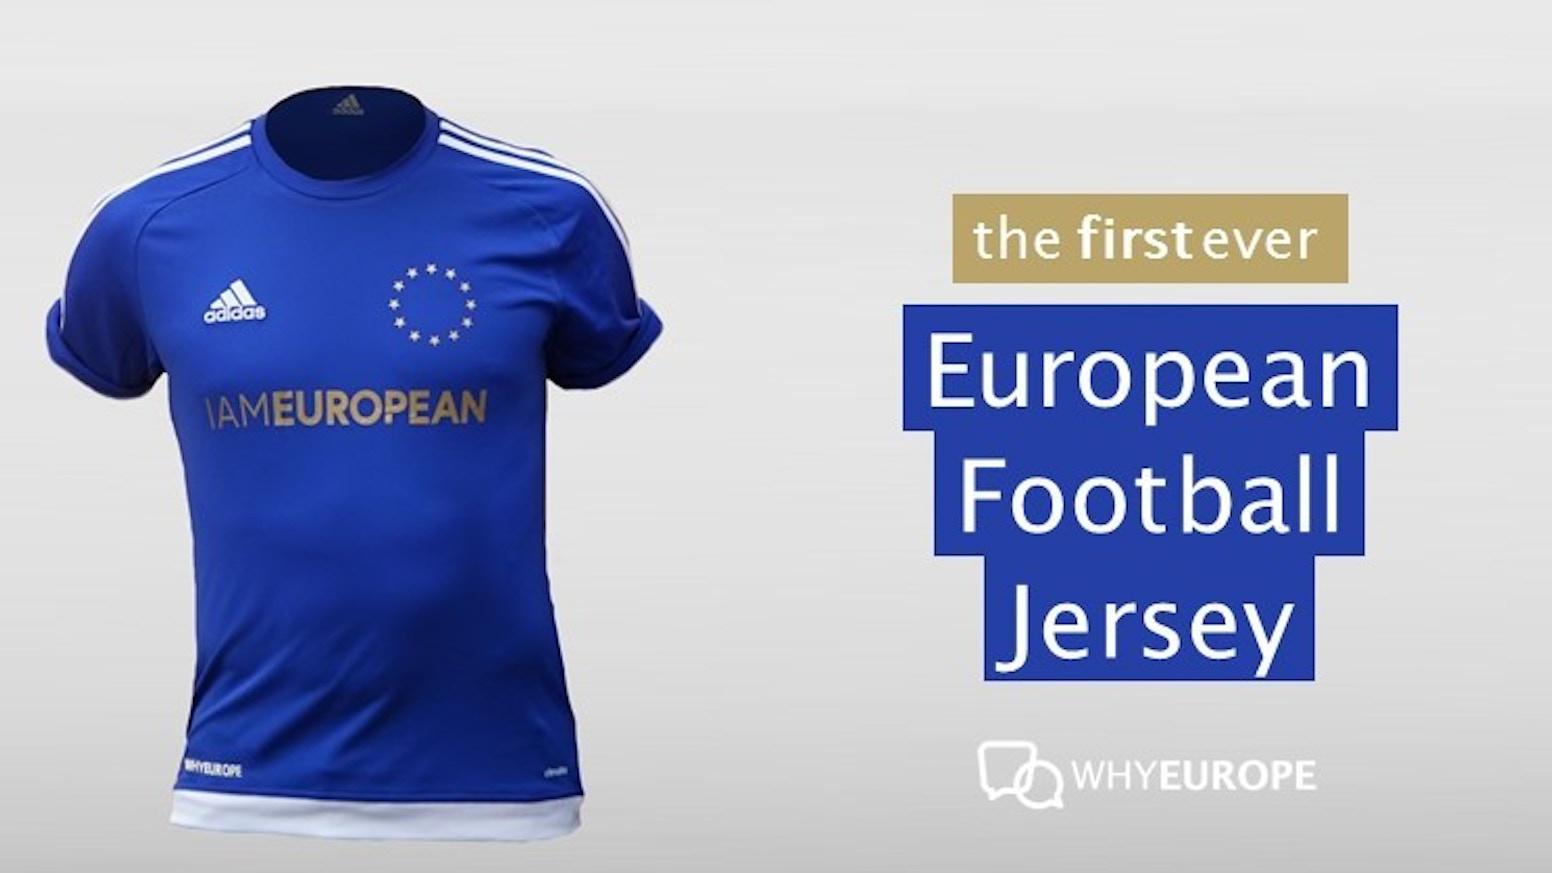 European Football Jersey by WhyEurope — Kickstarter